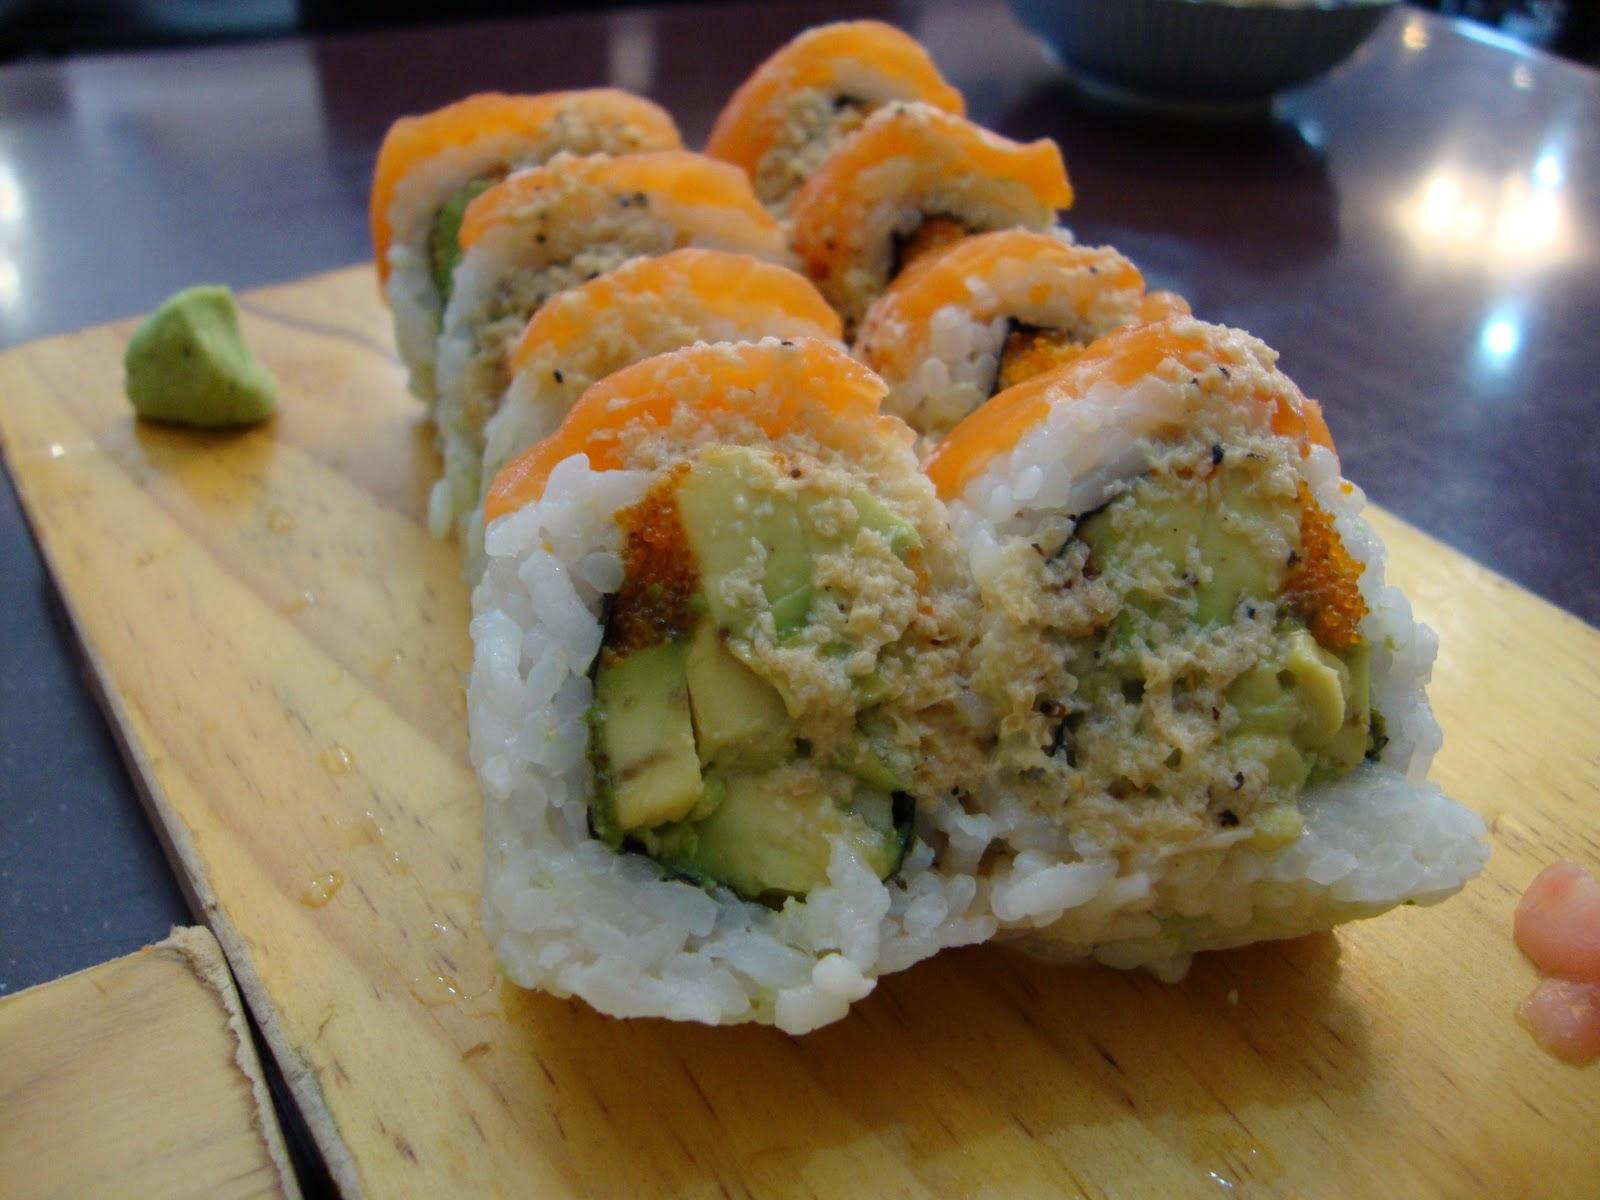 Baby Skeleton's Food Blog - YUMMY YUMMI FOOD: Sushi Town ...